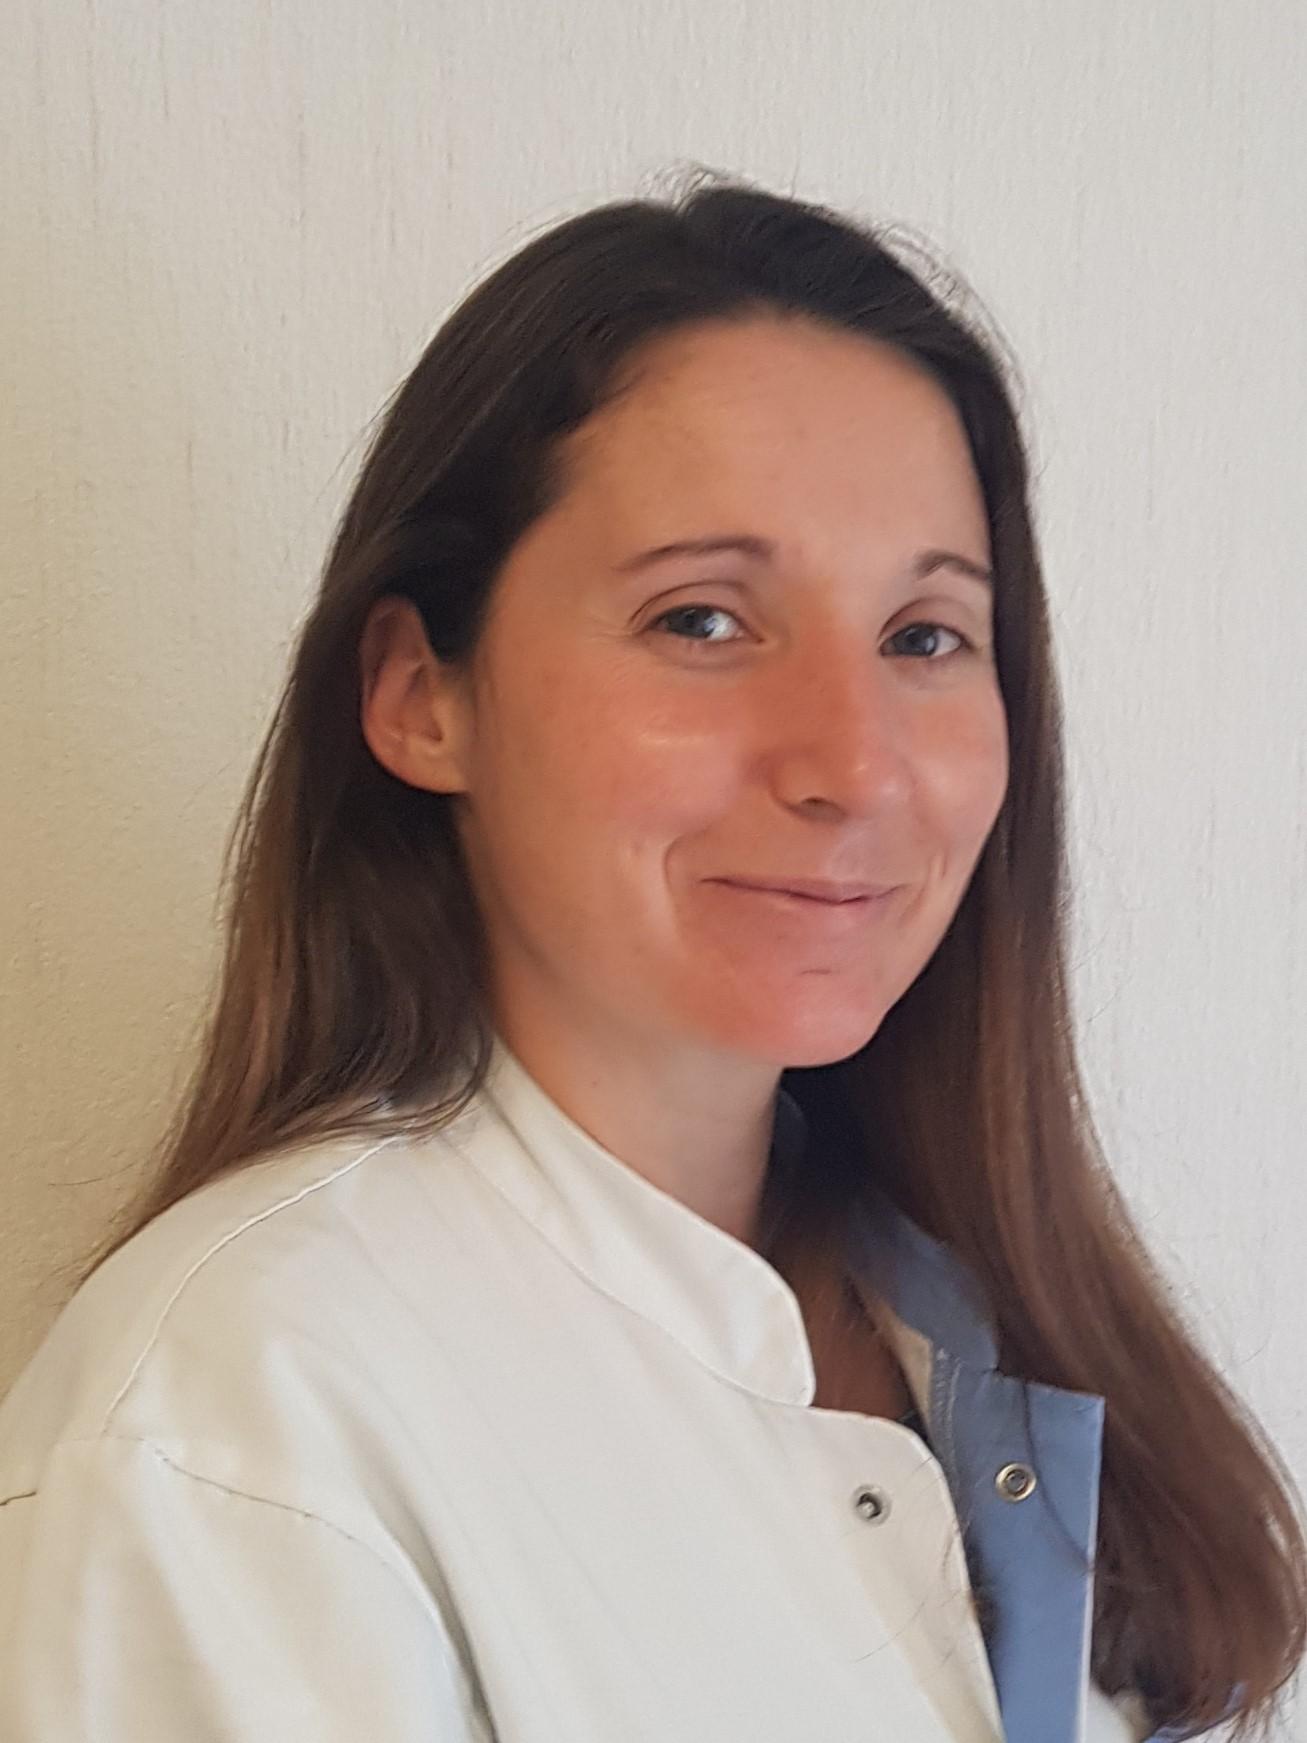 Emilie Di Constanzo